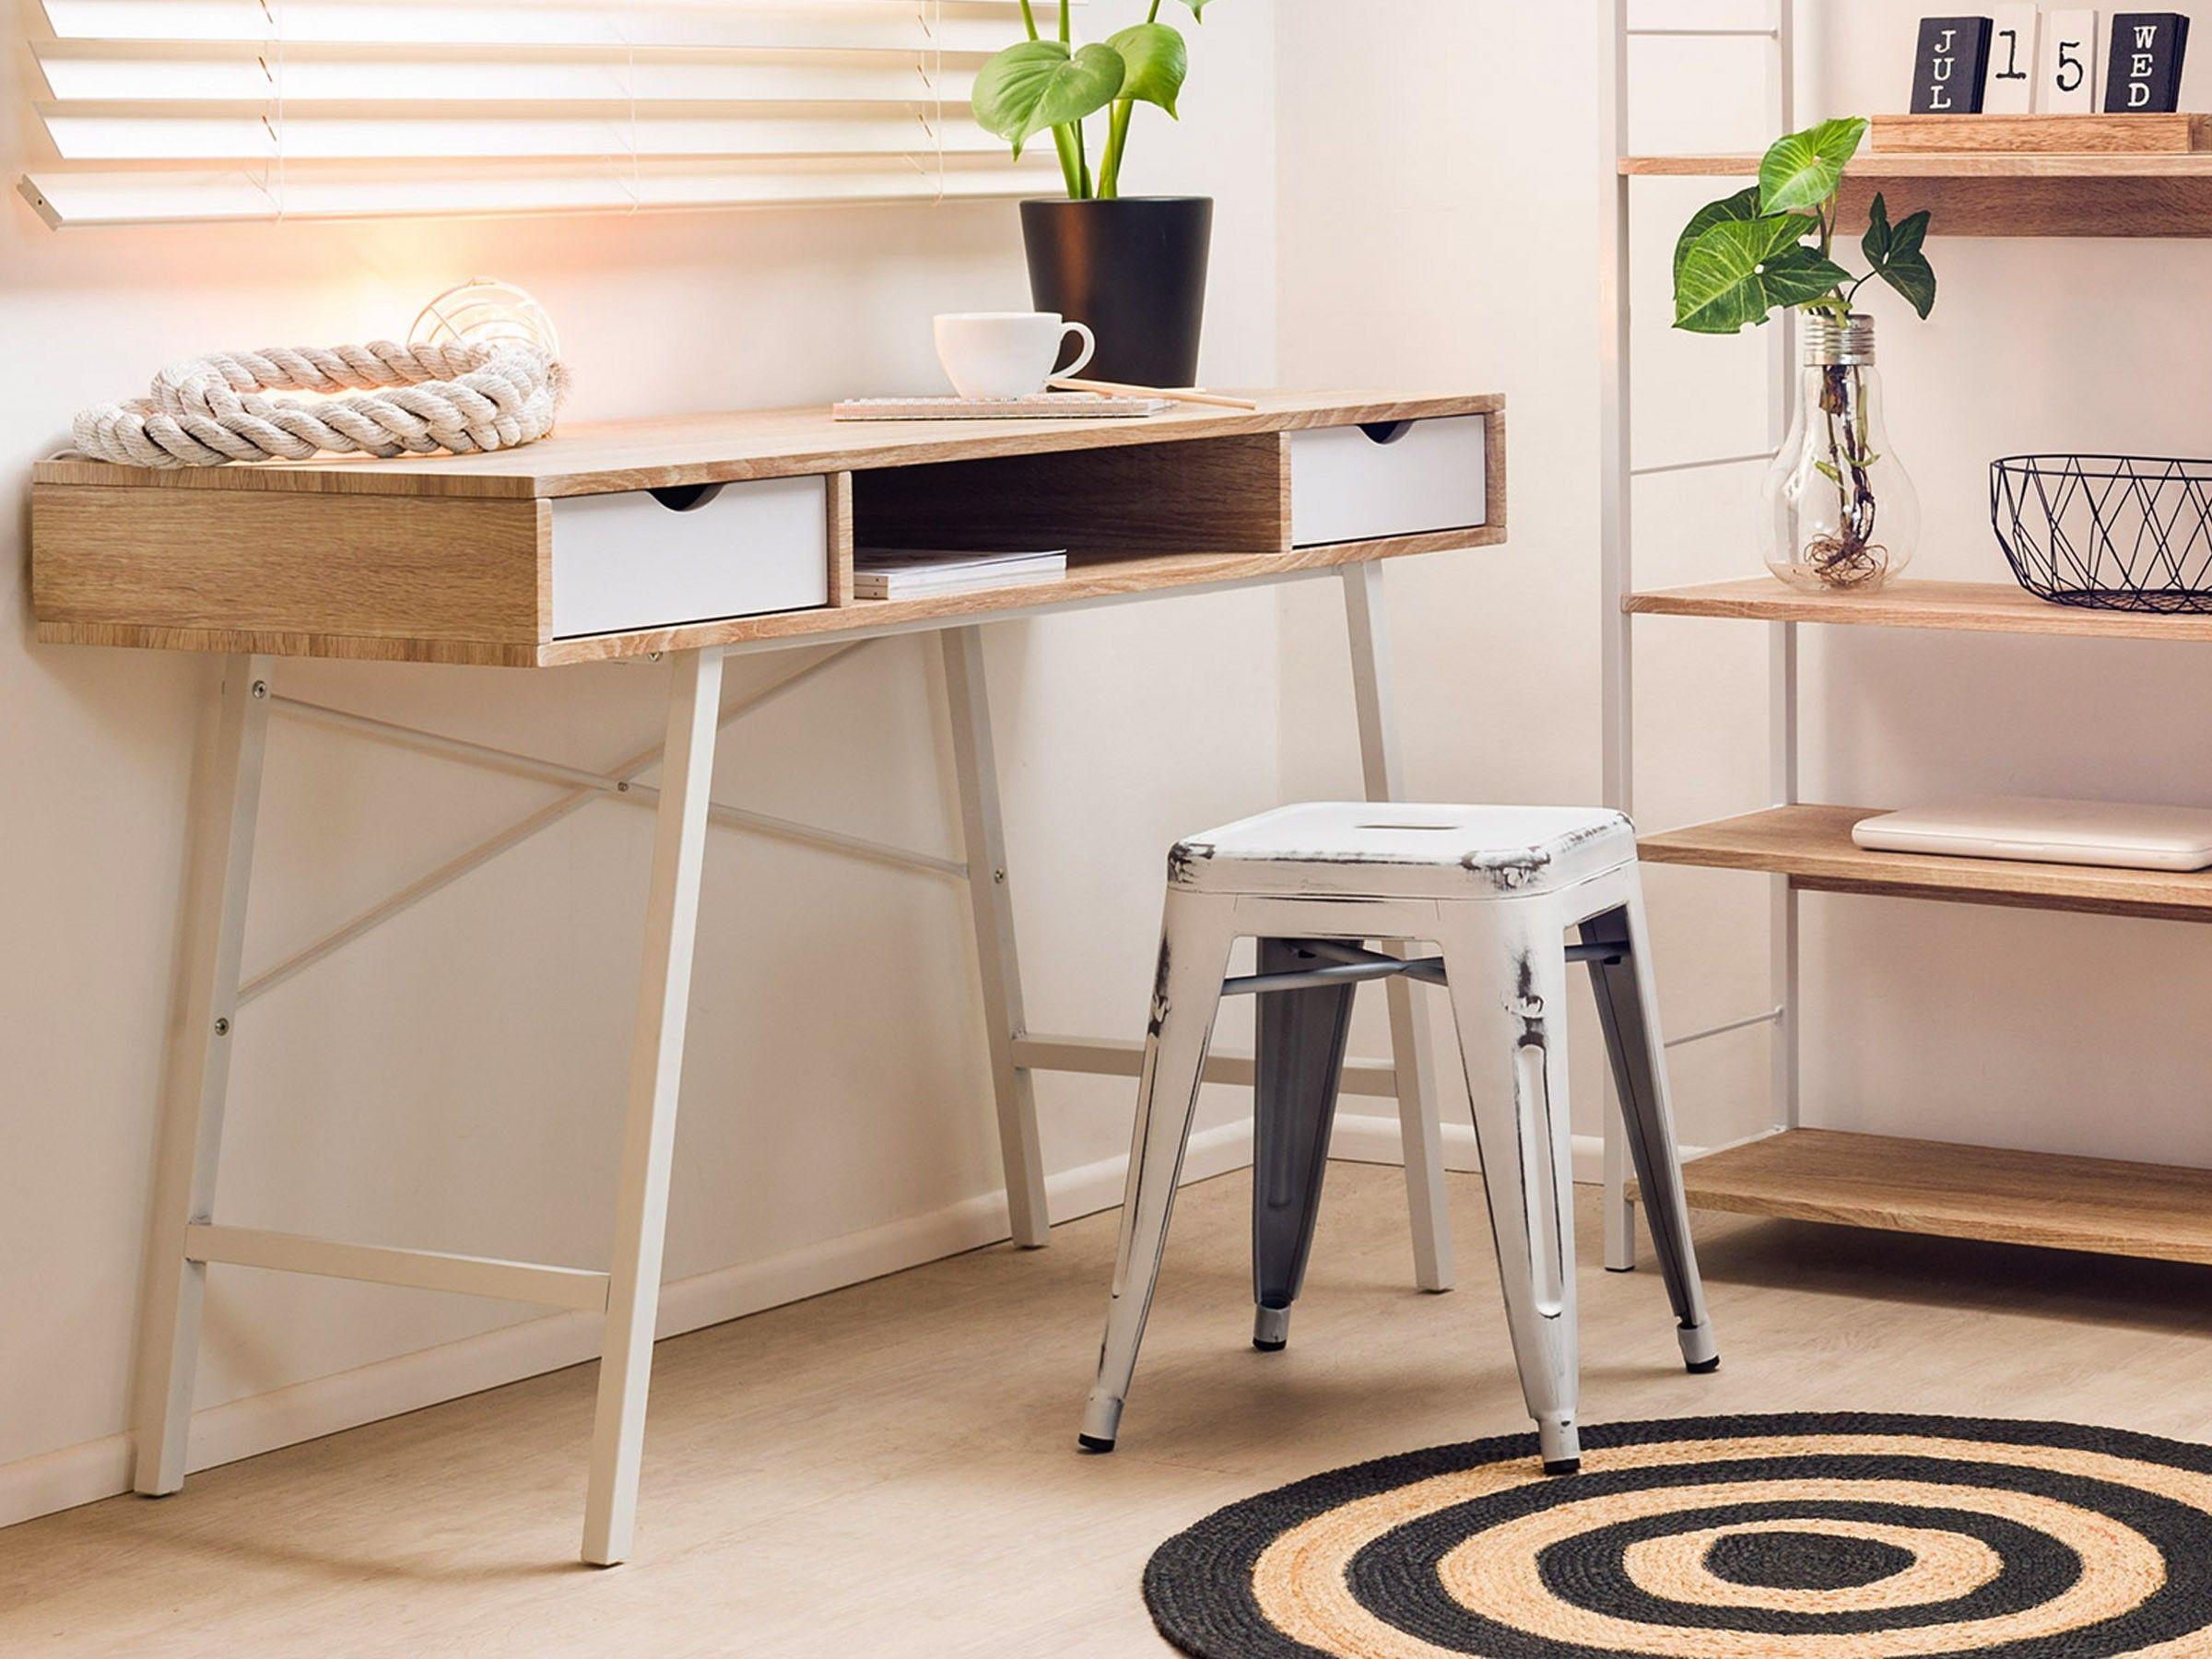 Vigo Desk Home fice Furniture Australia